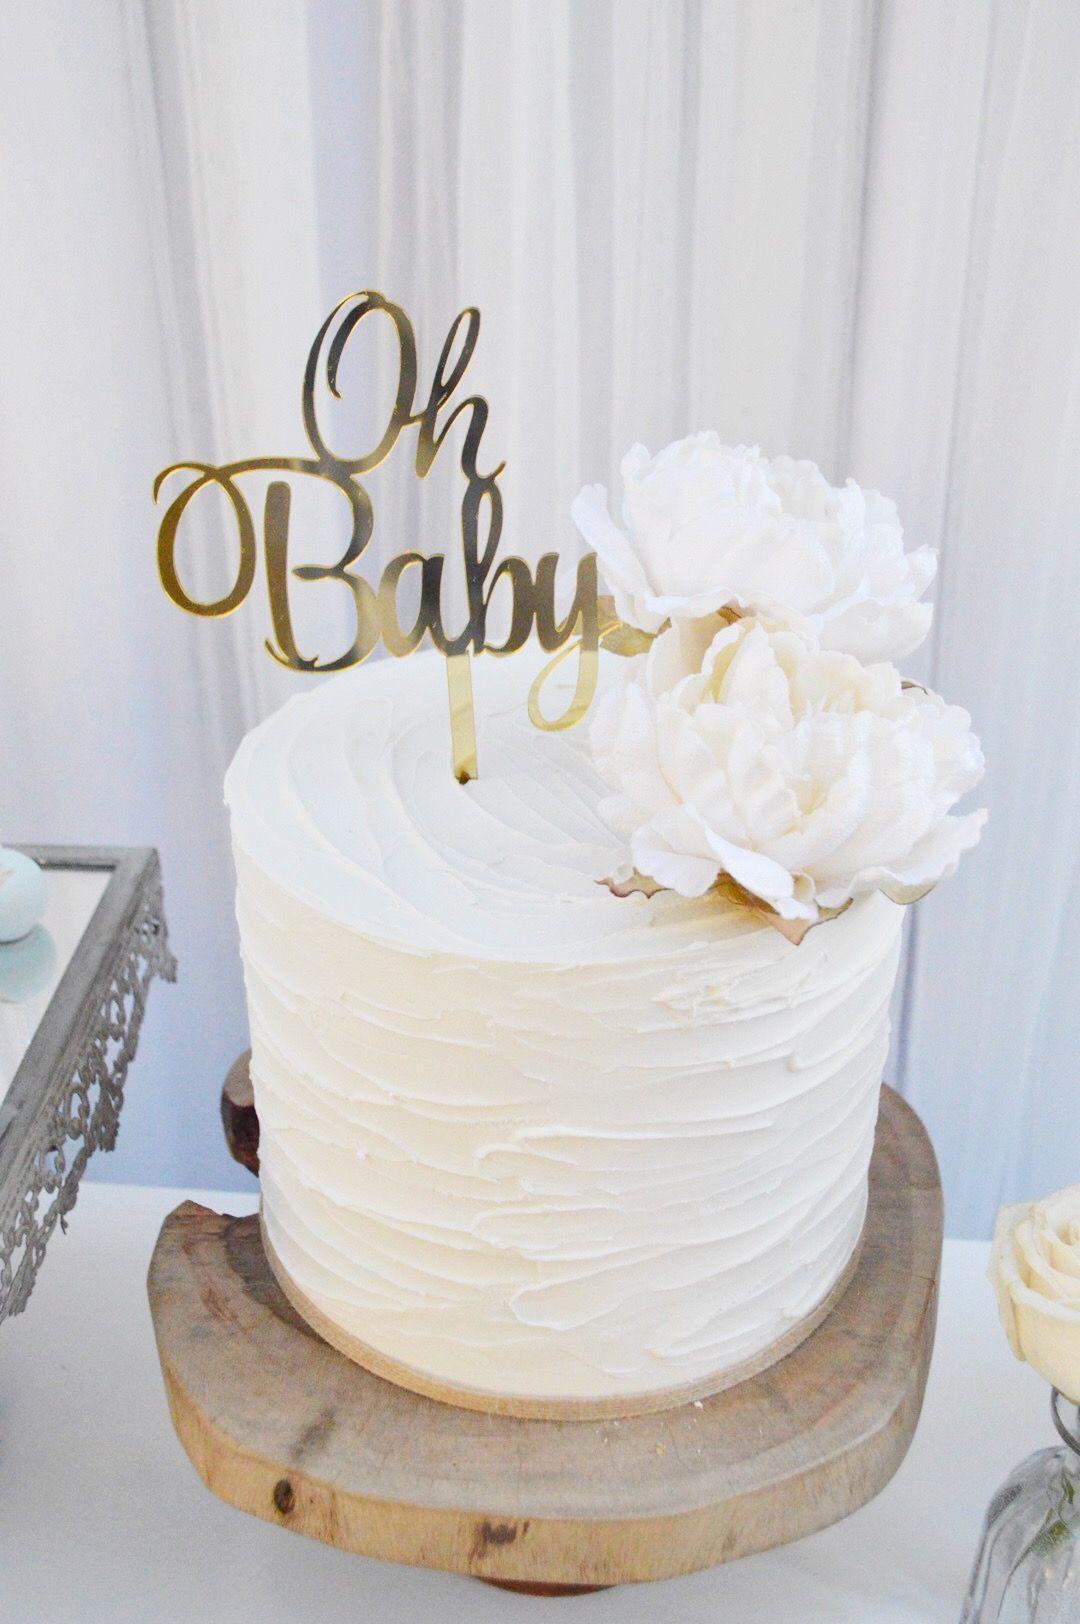 Gender Reveal Cake Gender Reveal Cake Baby Shower Gender Reveal Cake Baby Reveal Cakes